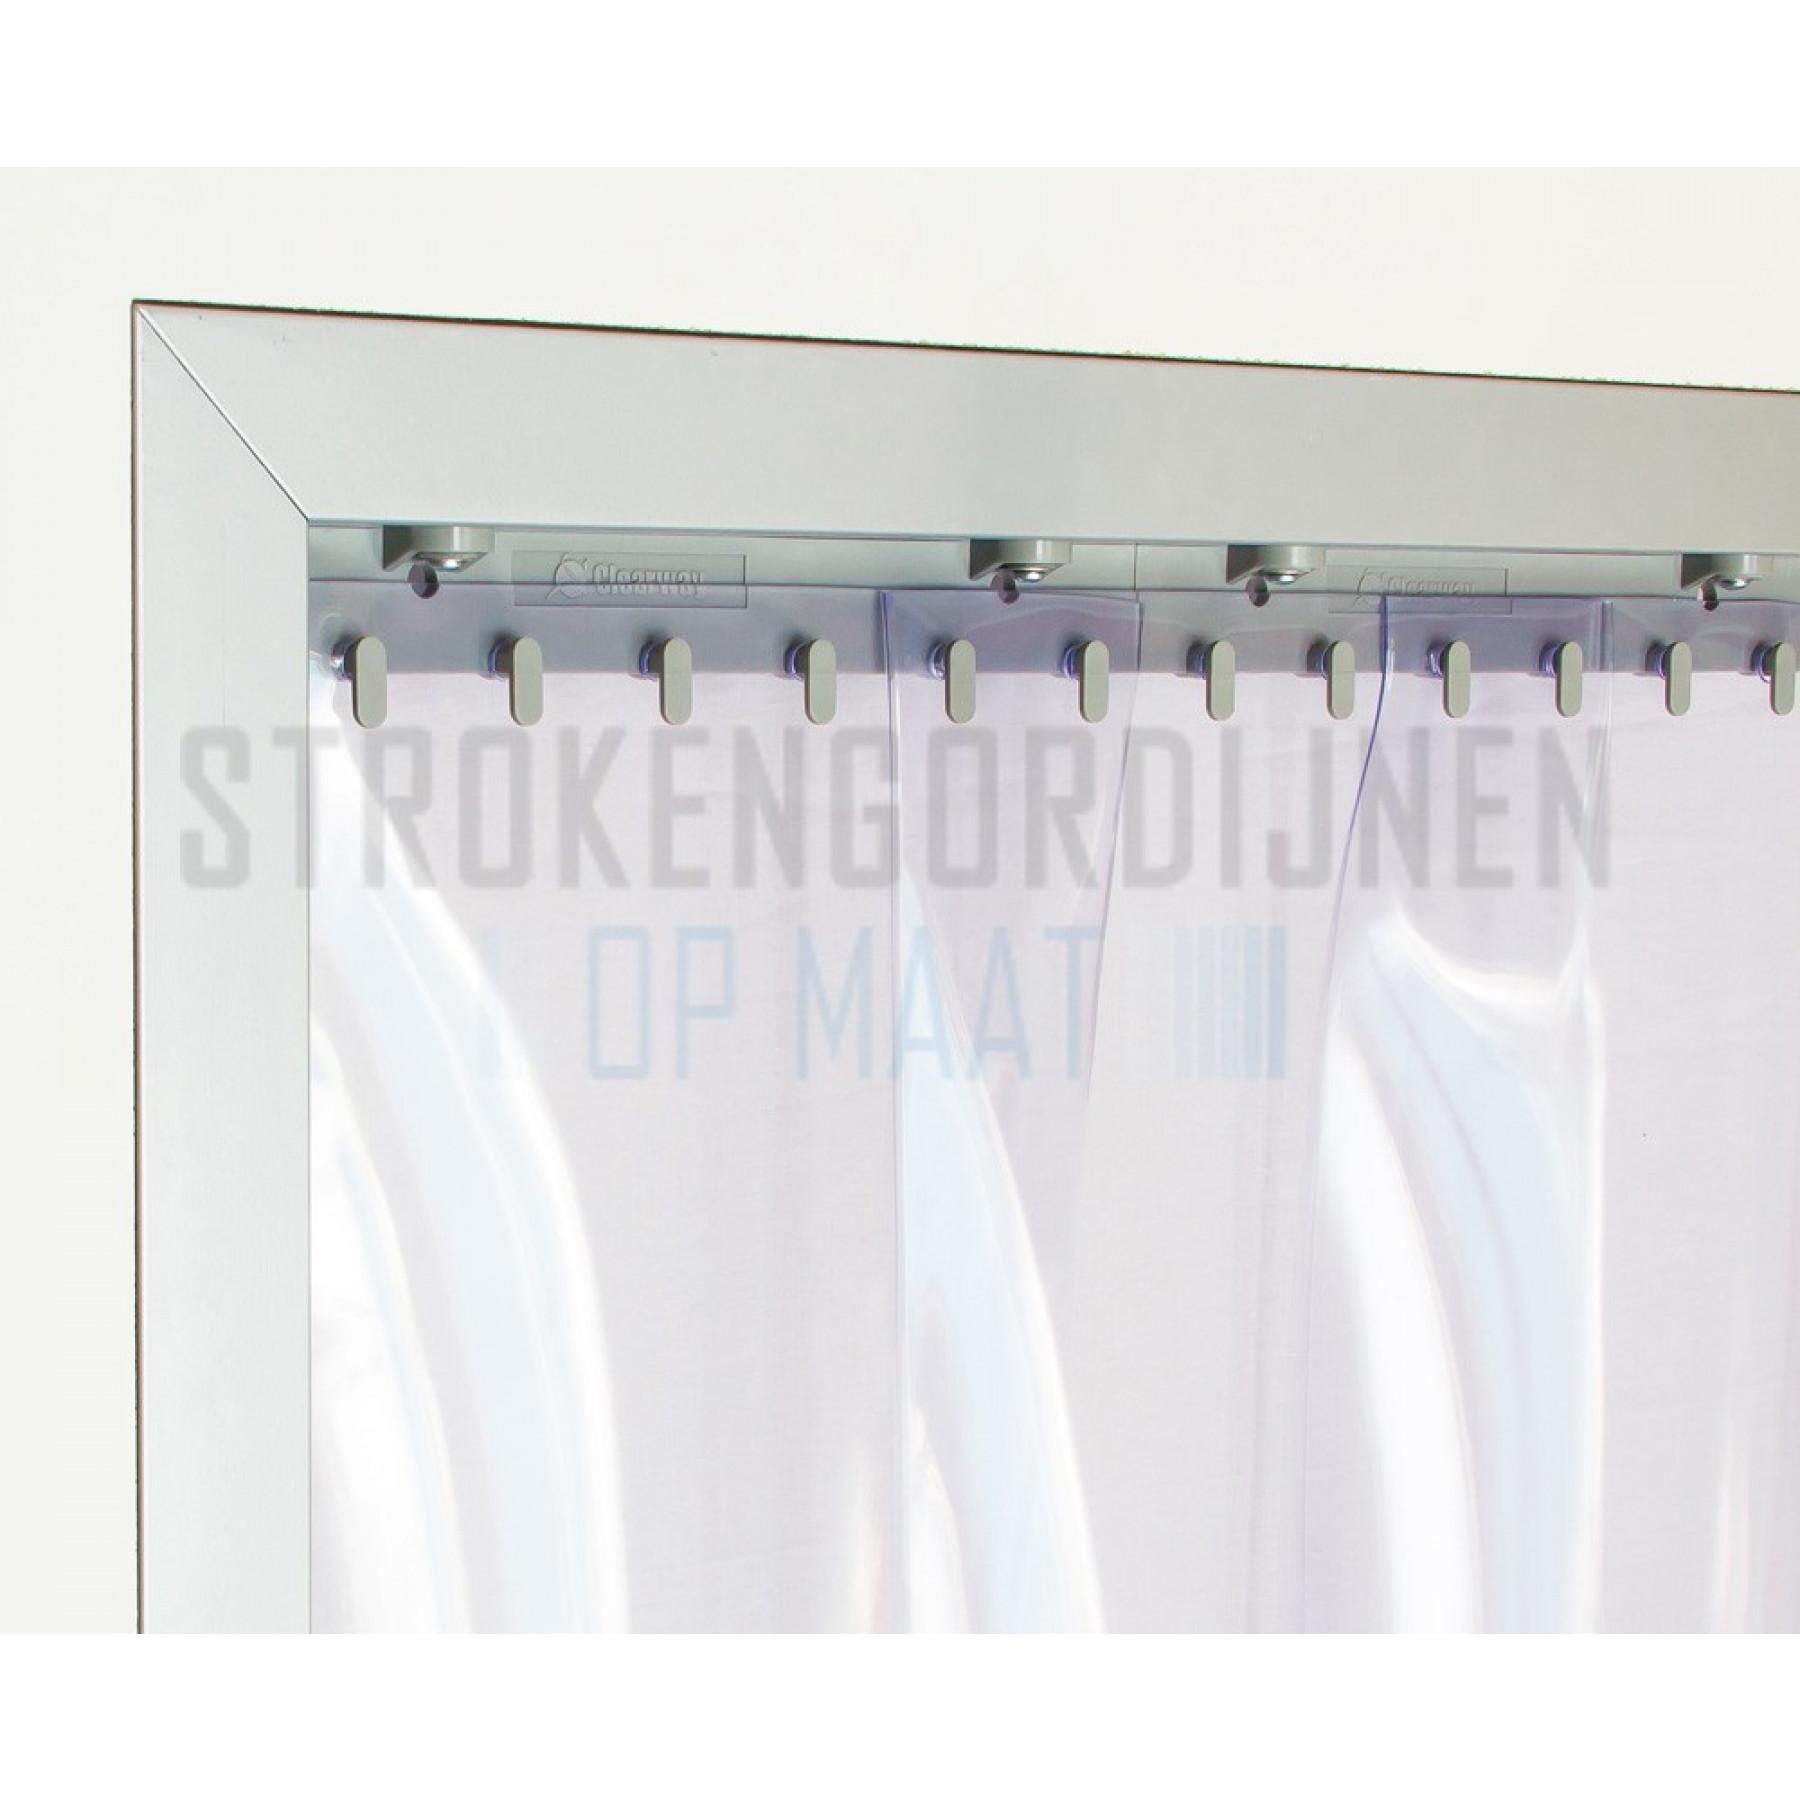 PVC stroken op maat, 300mm breed, 3mm dik, transparant